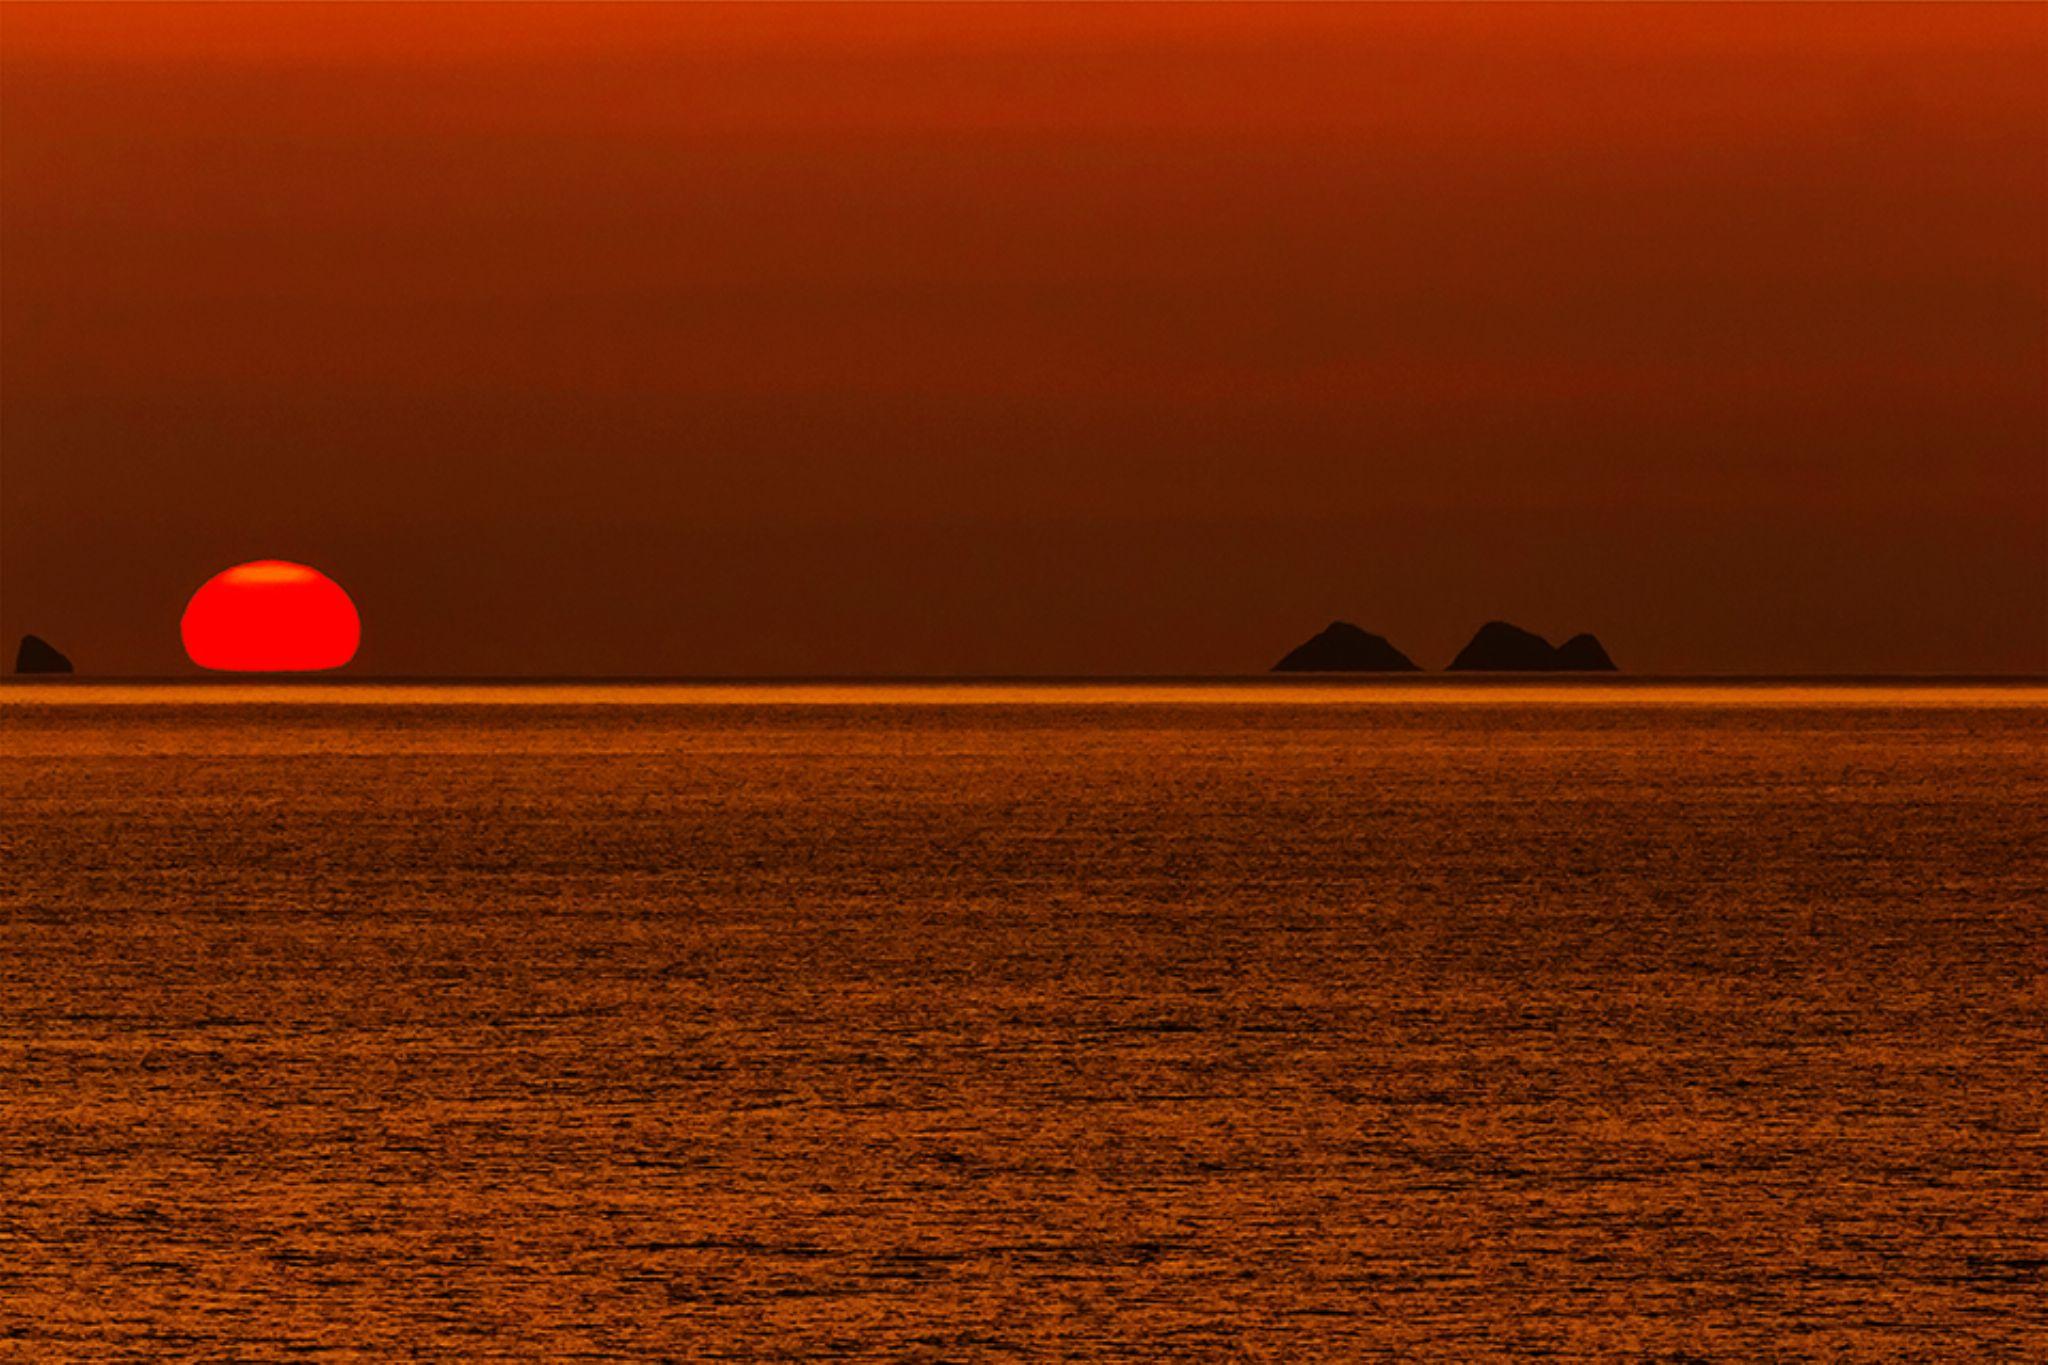 Sunset by Artur Ilkow